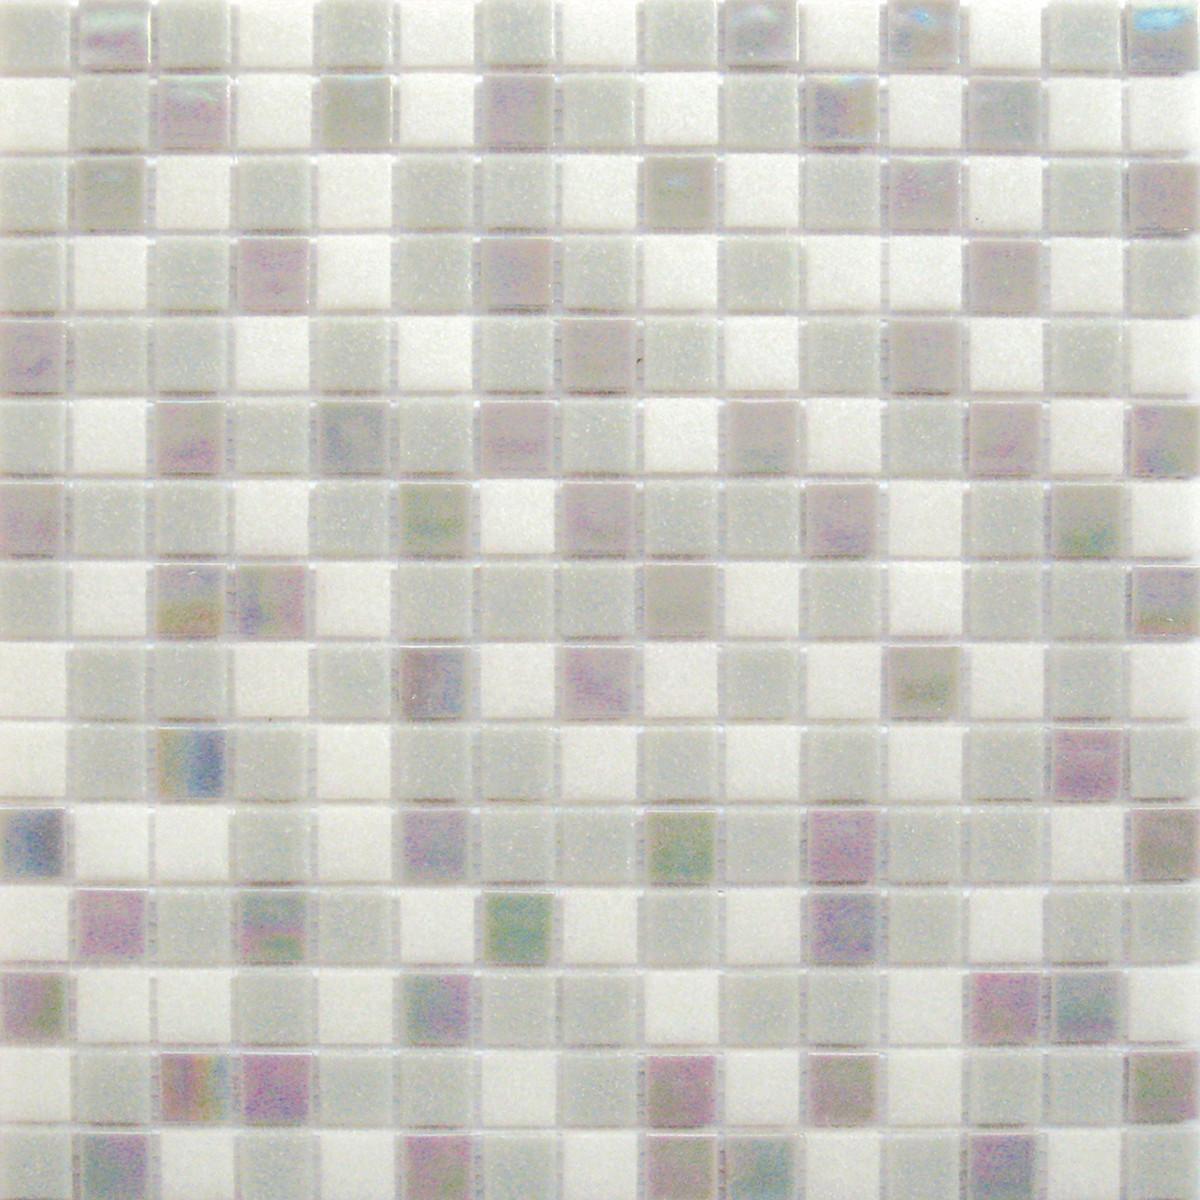 Mosaico plus 30 x 30 grigio prezzi e offerte online - Piastrelle mosaico leroy merlin ...